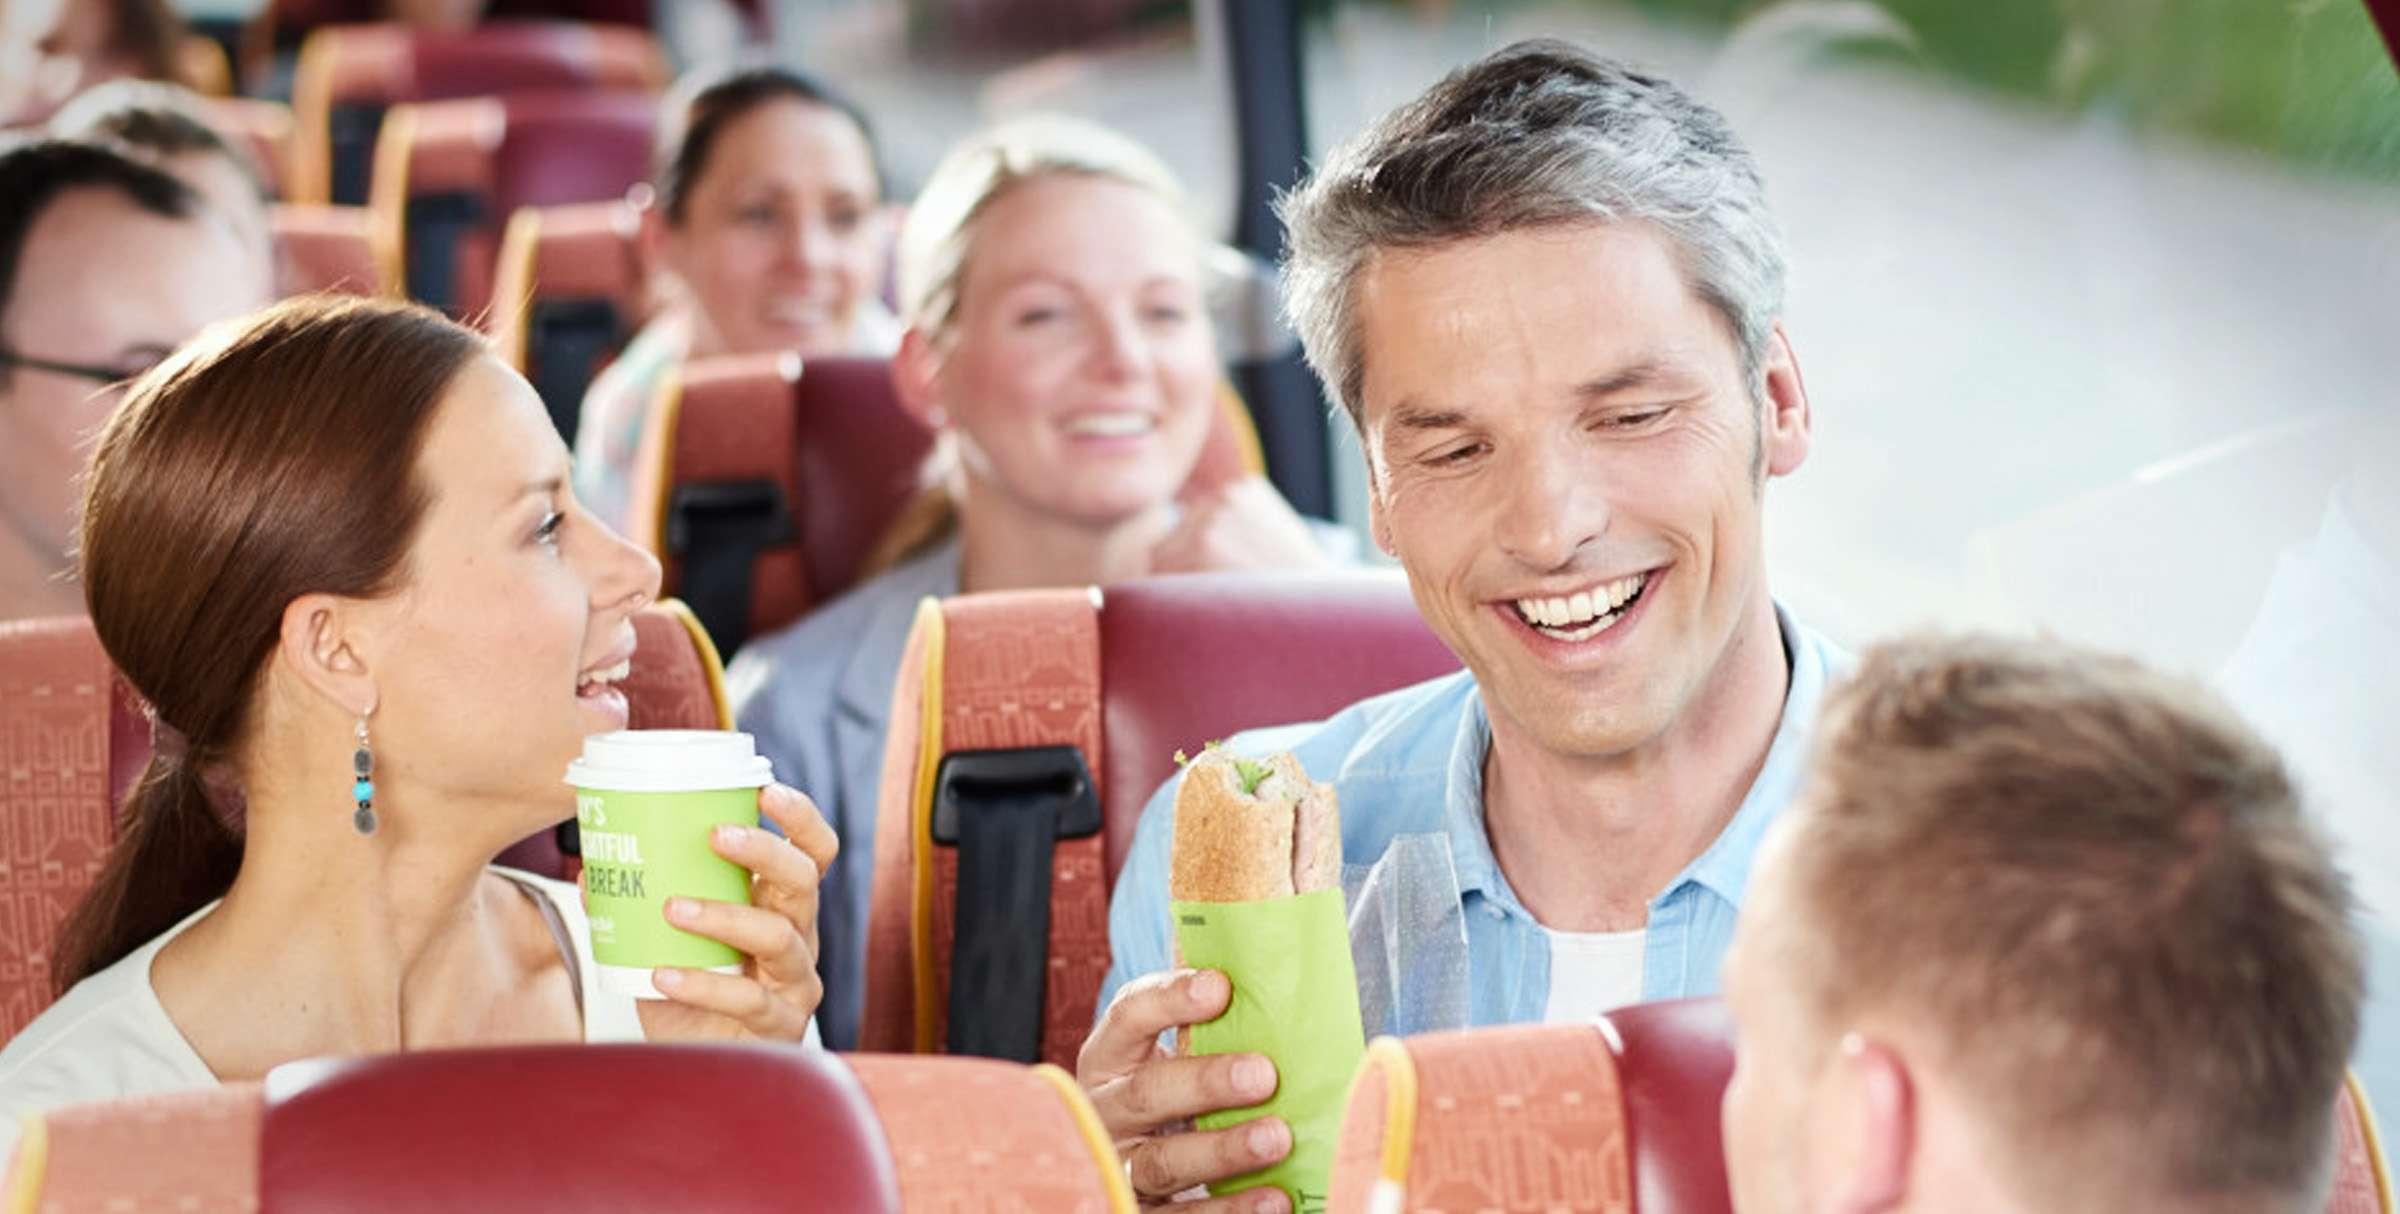 Busfahrer Rast Restaurant